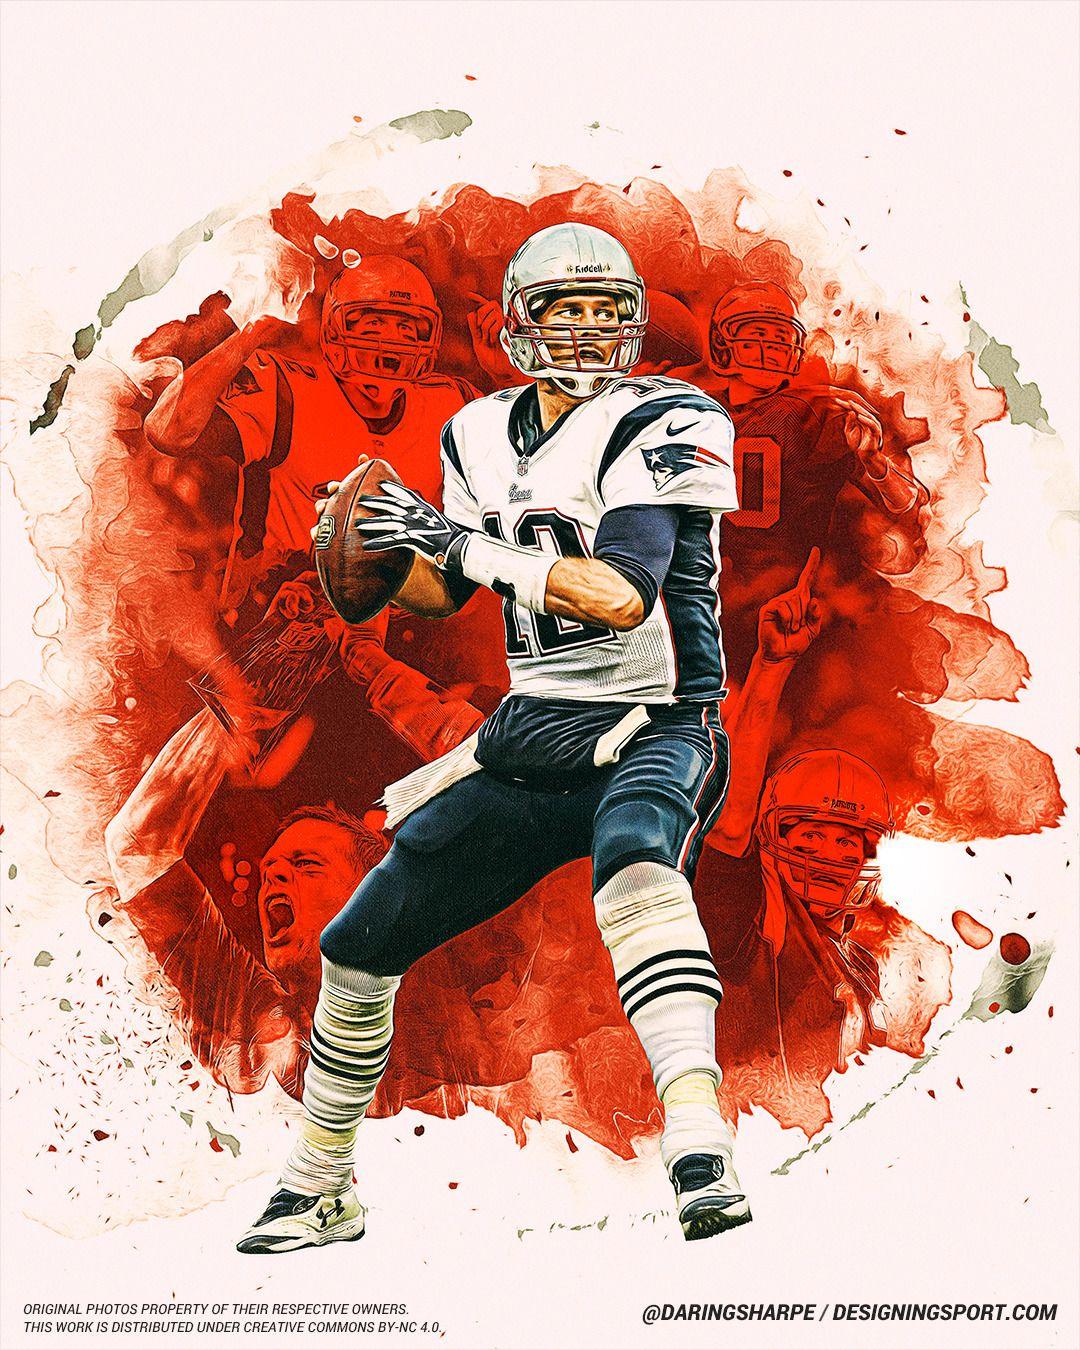 28 3 Designingsport Tom Brady New England Patriots New England Patriots Patriots Sports Art